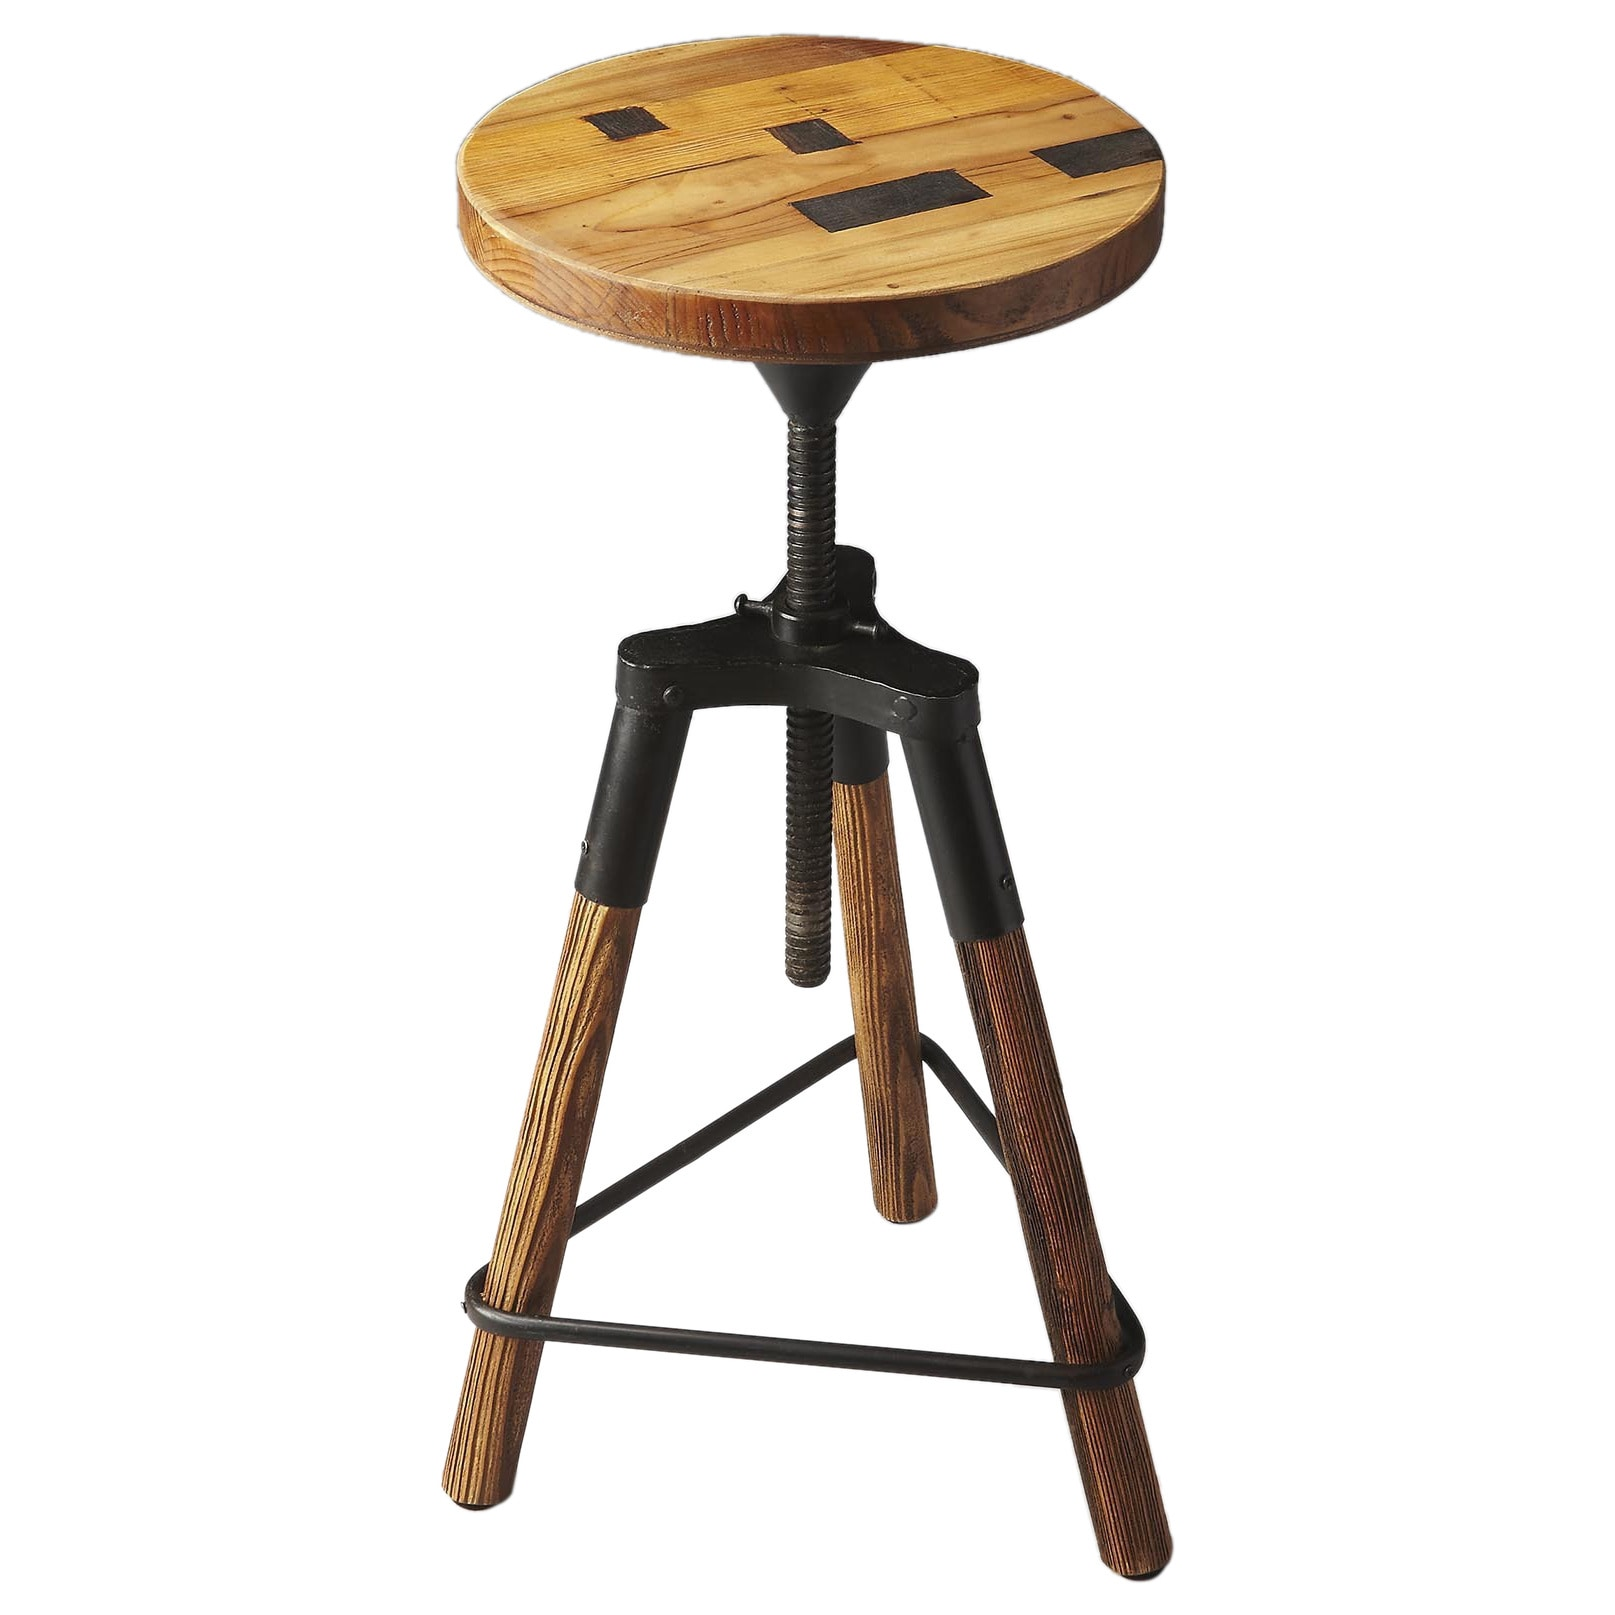 Super Butler Hinton Reclaimed Wood Revolving Bar Stool Machost Co Dining Chair Design Ideas Machostcouk